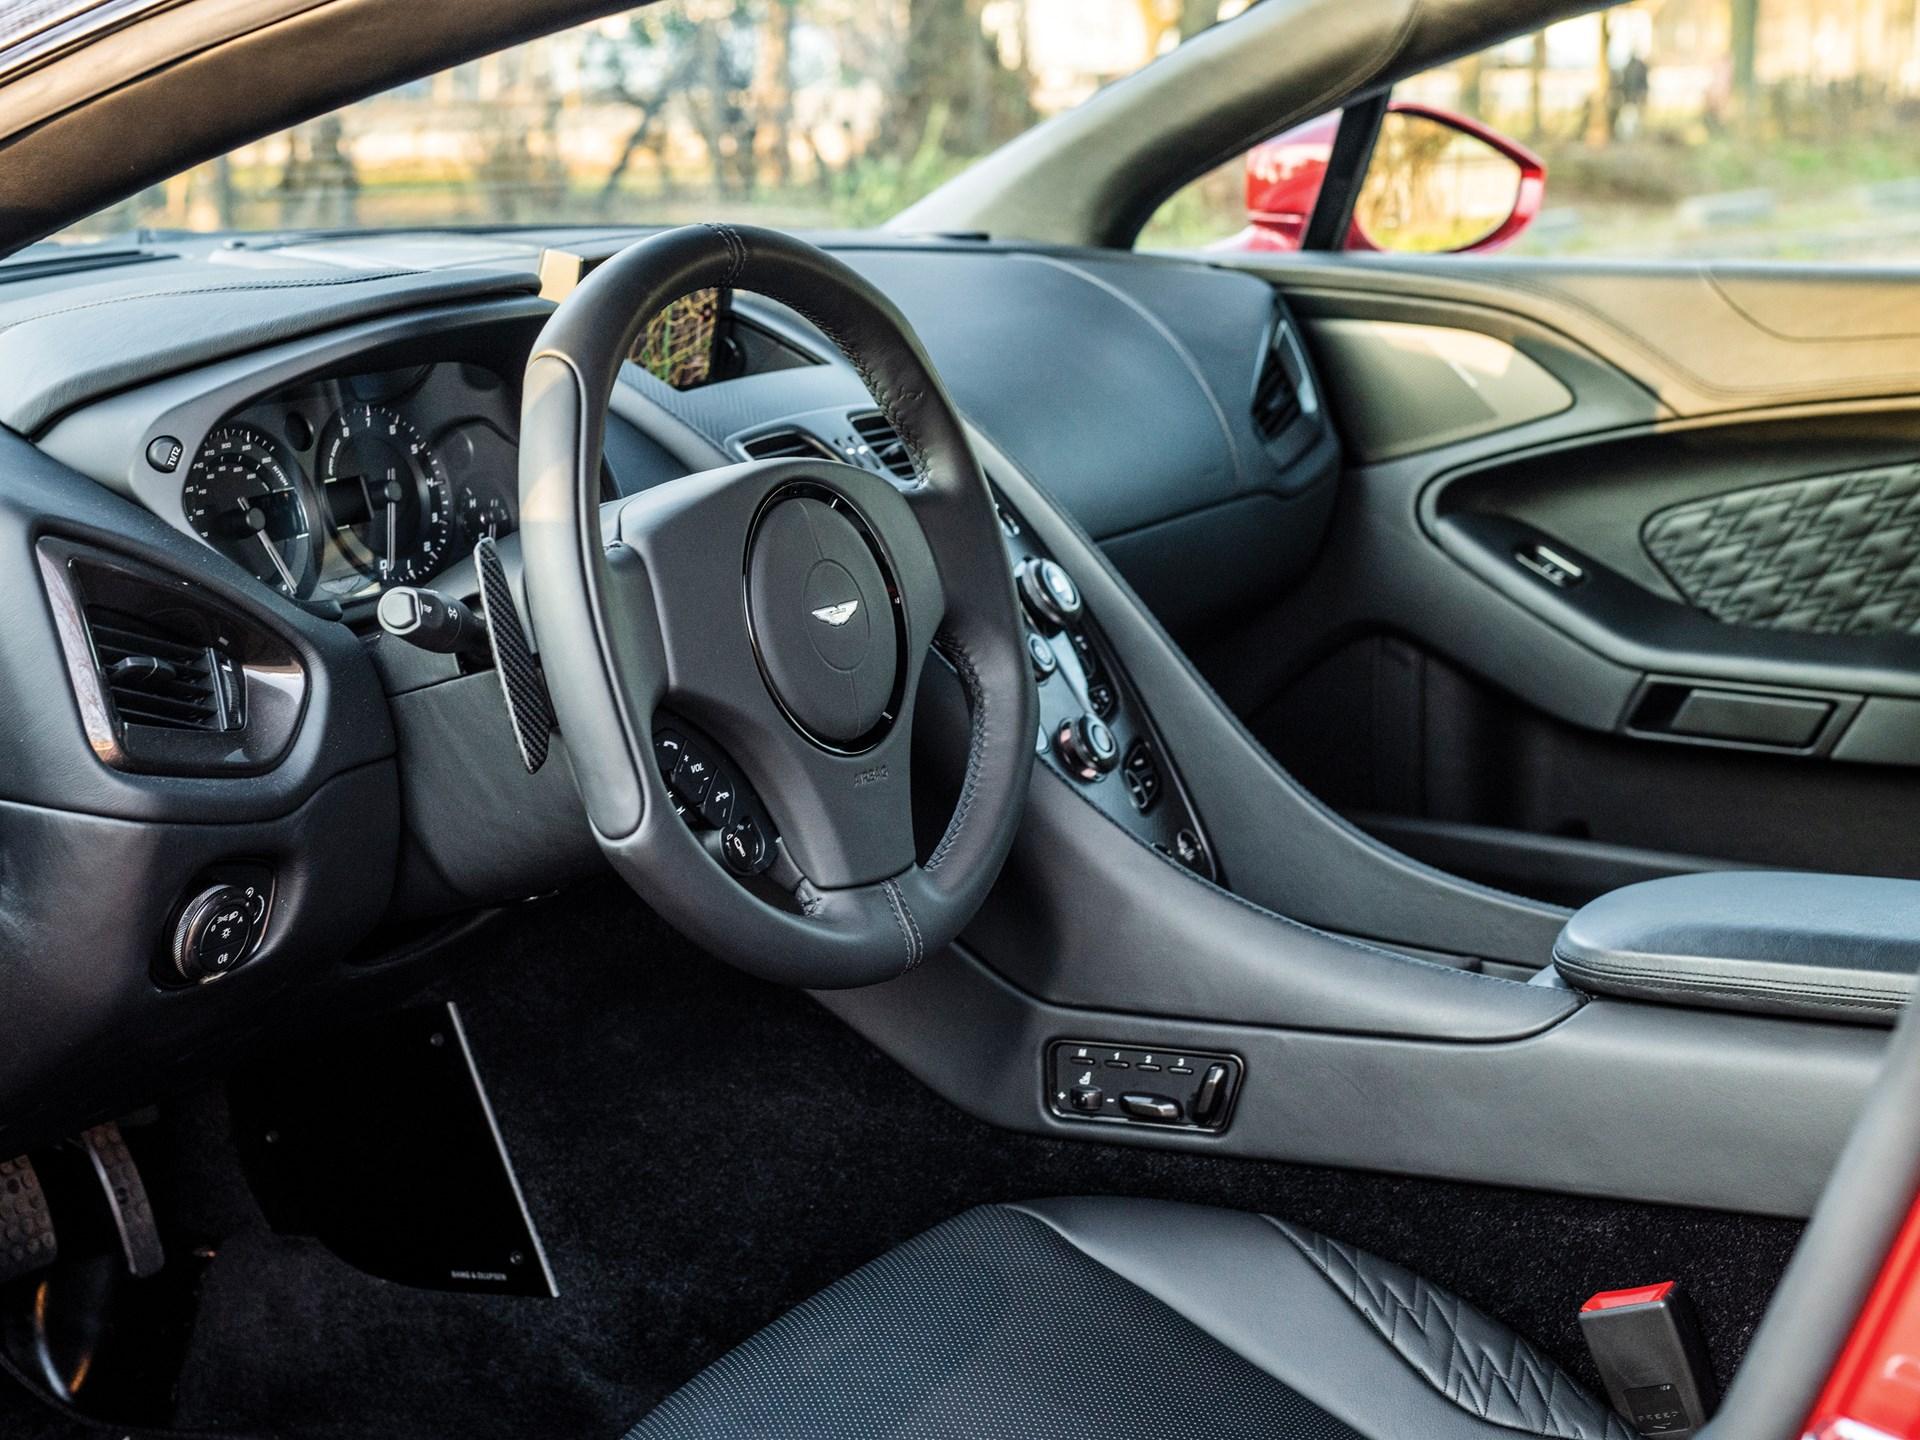 Aston Martin Dbs Zagato 2019